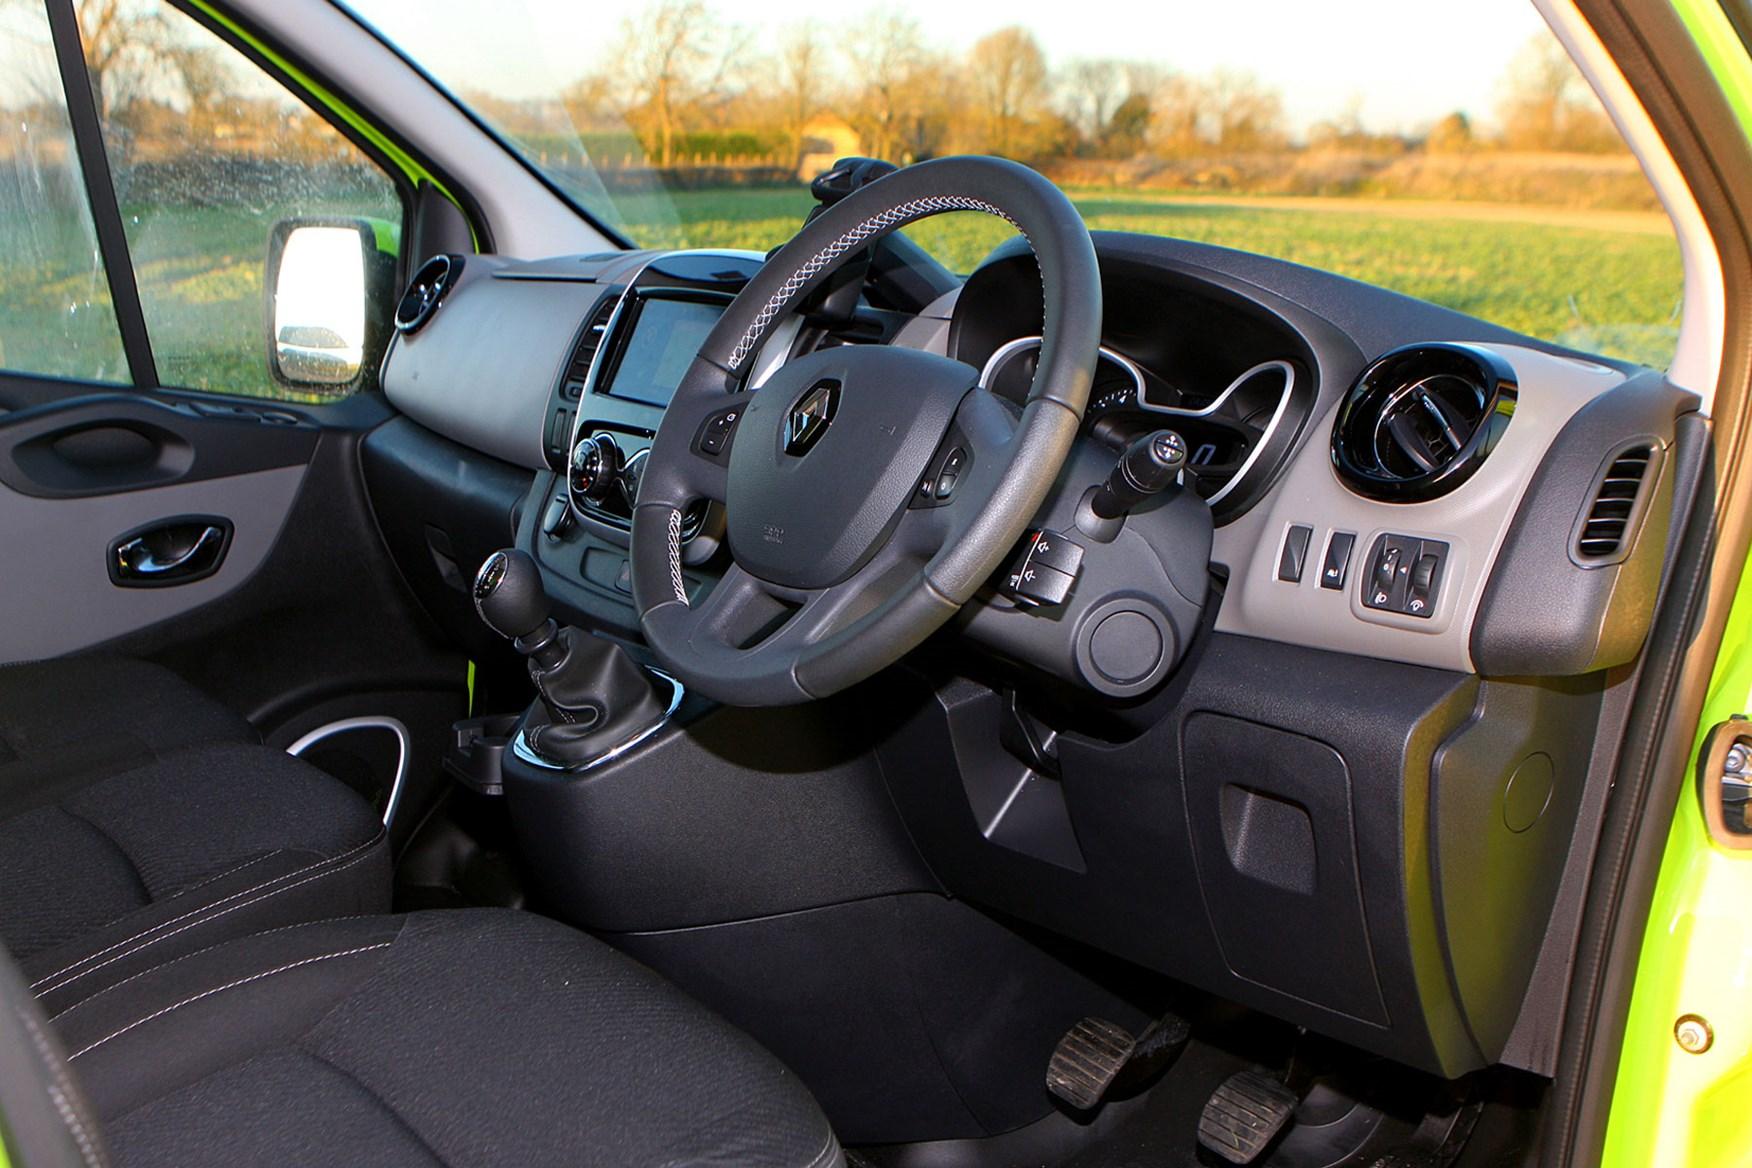 Renault Trafic Sport Euro 6 review - cab interior